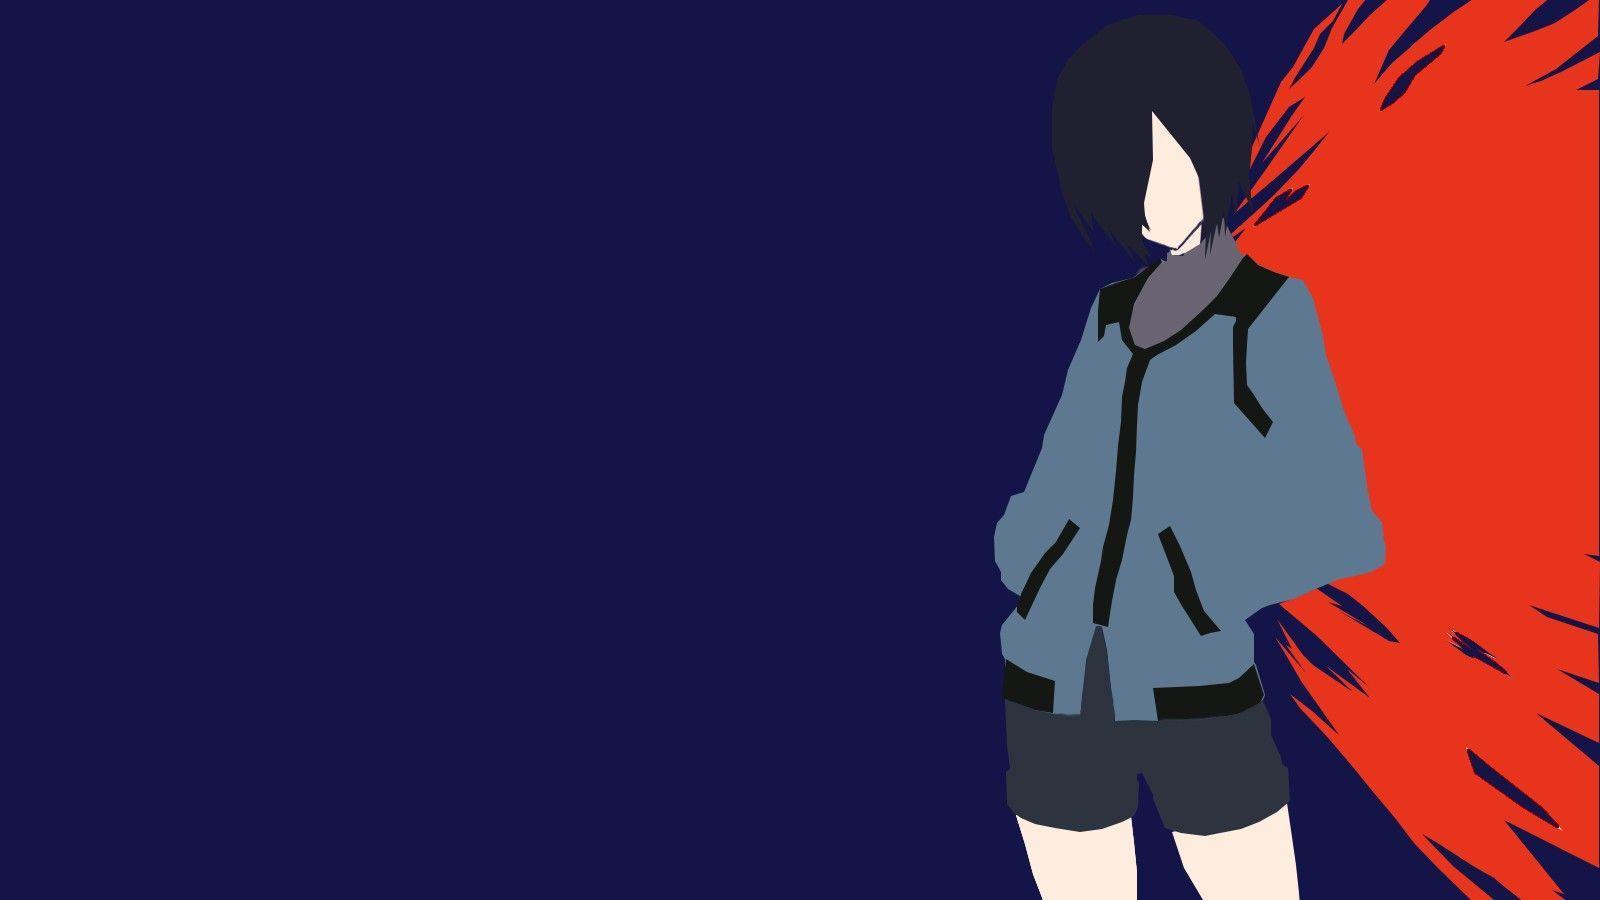 11+ Anime Minimalist Wallpaper 4k - Baka Wallpaper